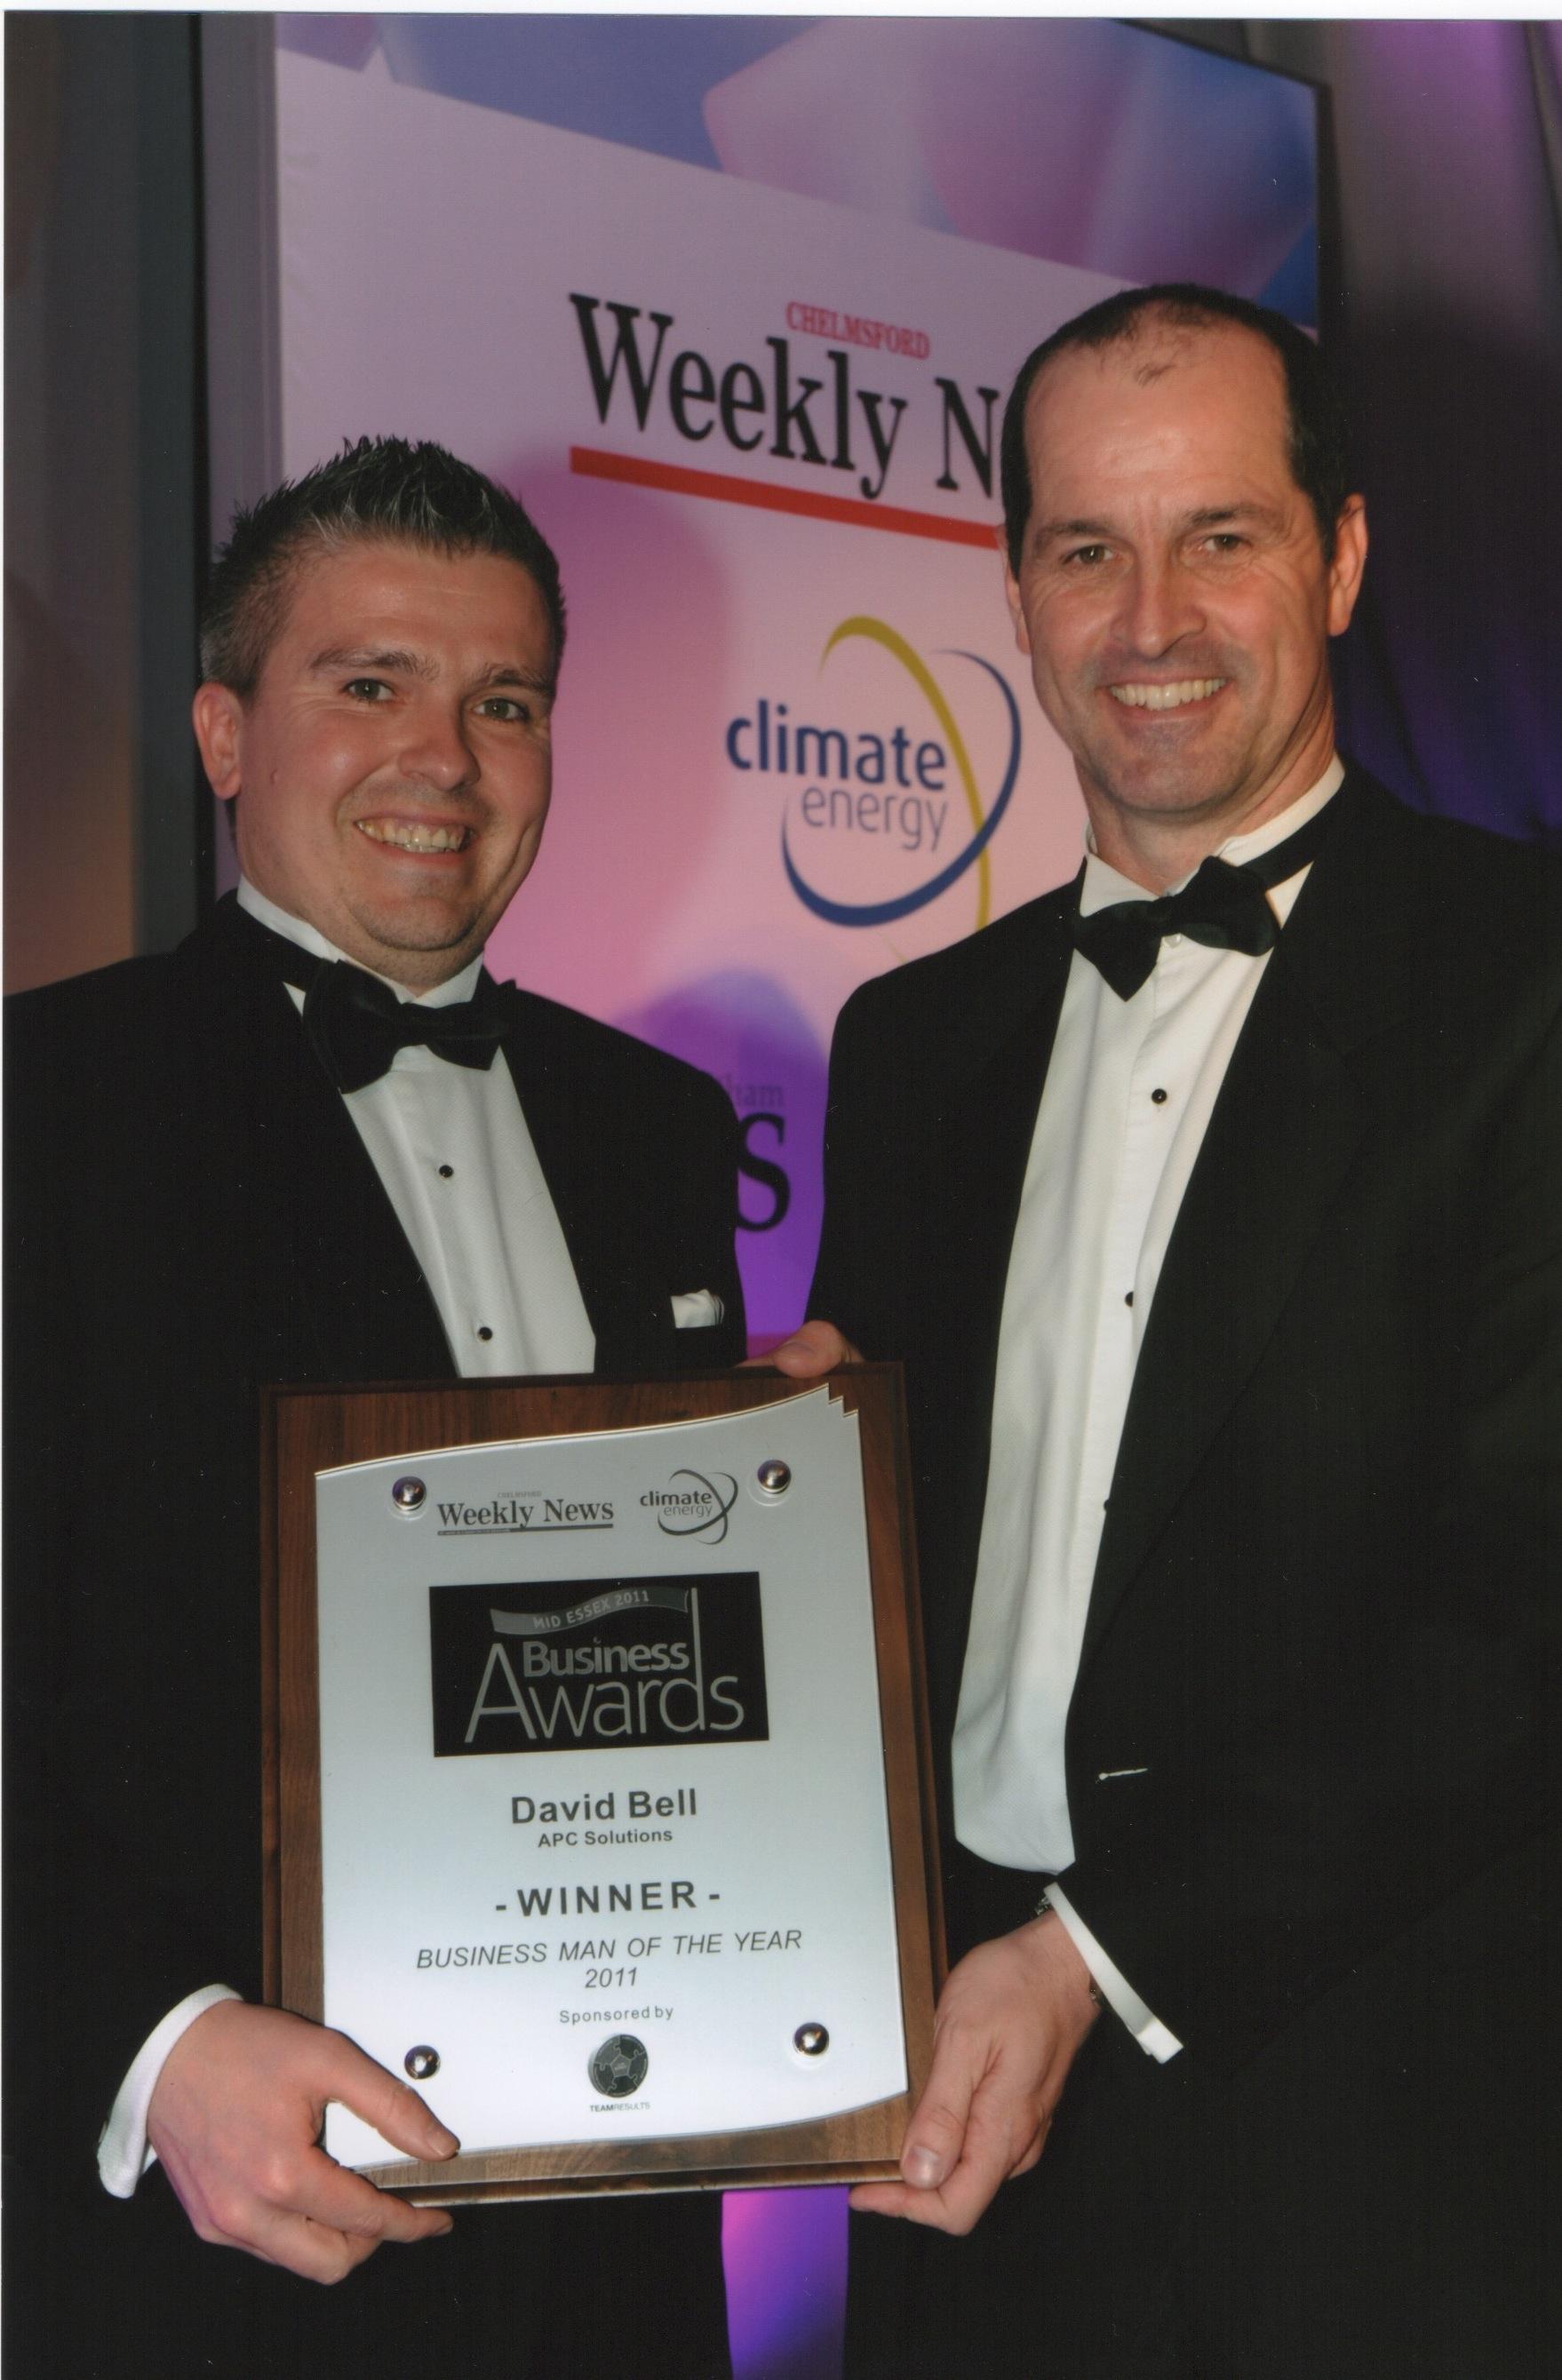 David Bell Winner of Essex Businessman 2011